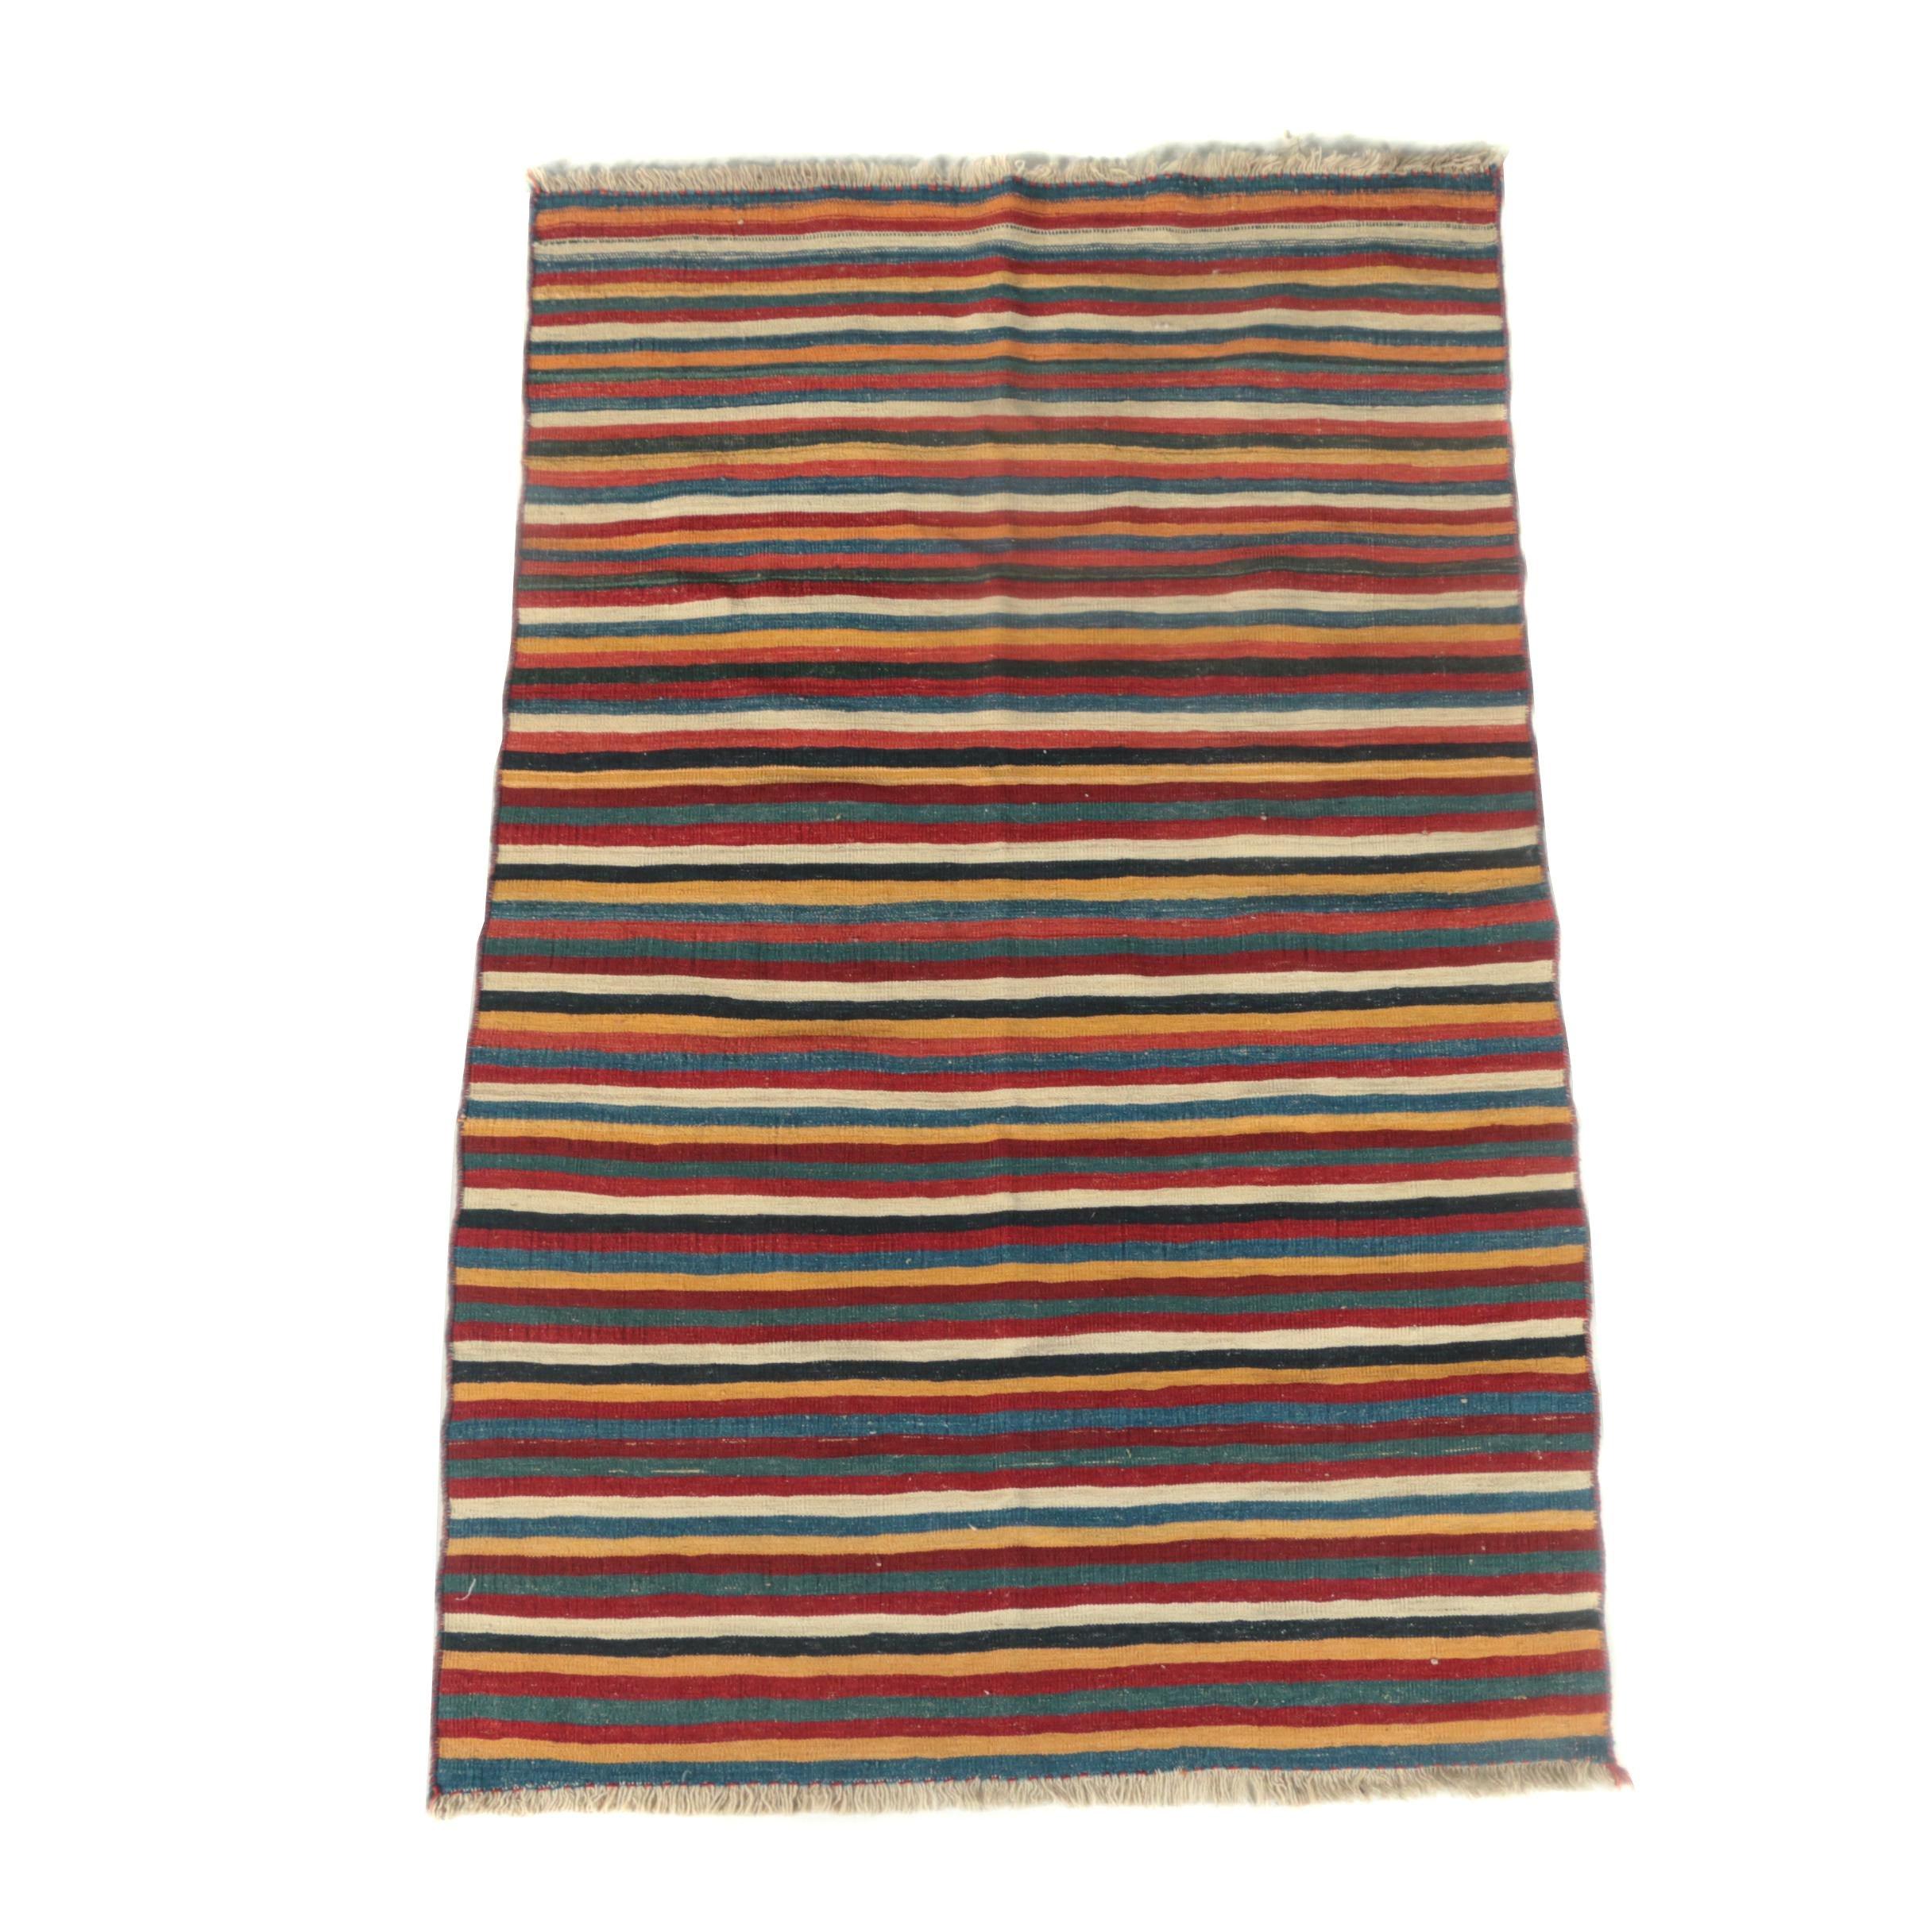 Handwoven Persian Shahsavan Banded Wool Kilim